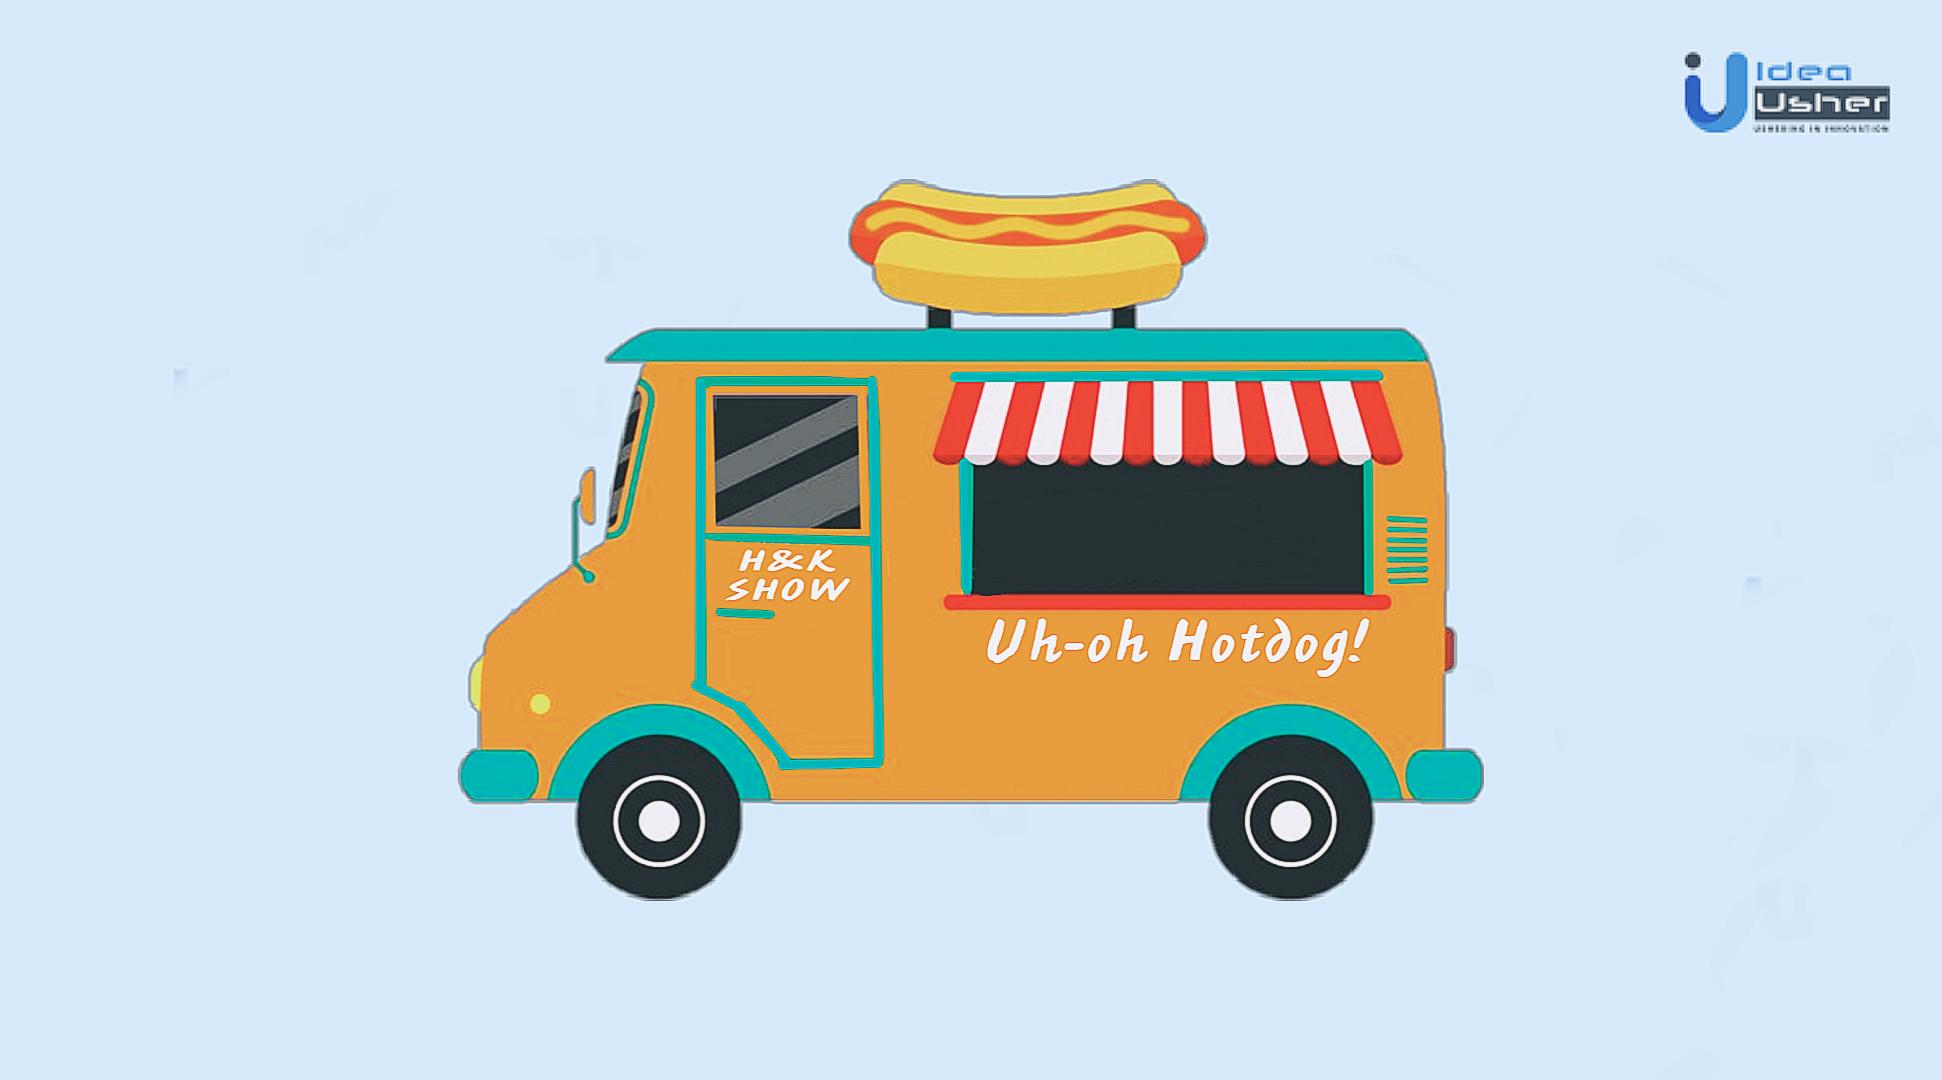 App For Food Truck - Idea Usher